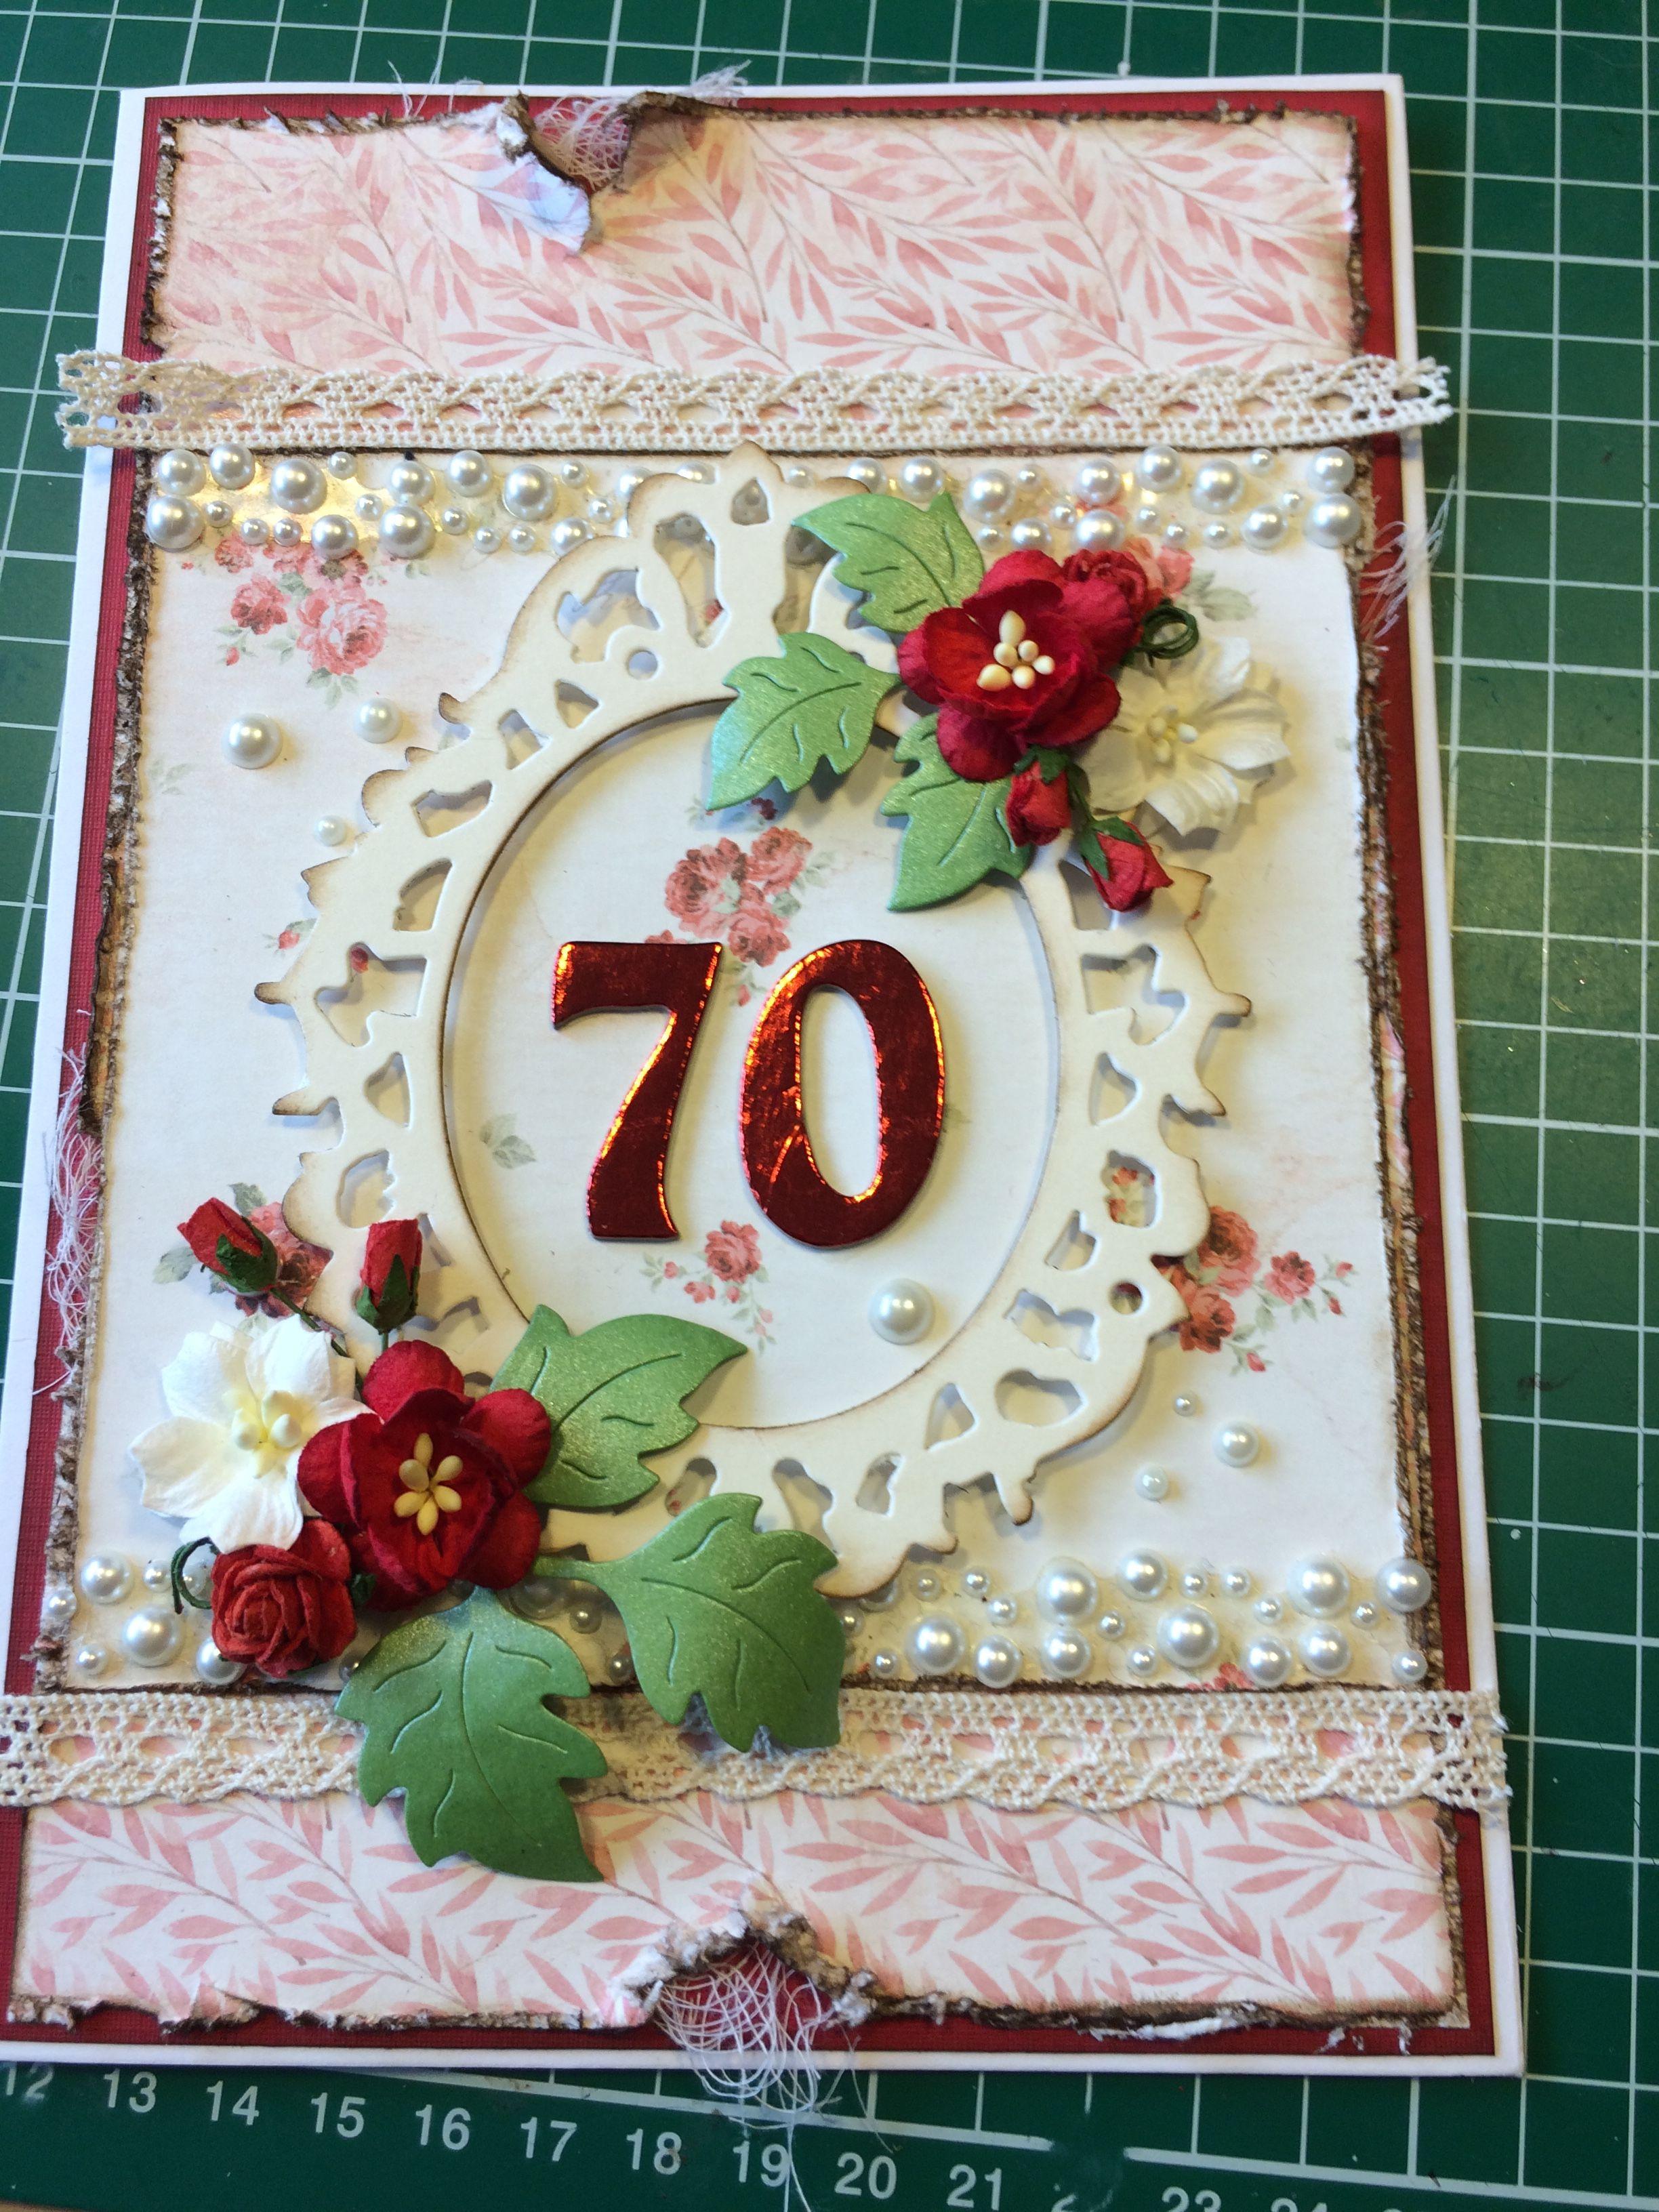 Kort til 70 års fødselsdag Maja Design 2016 | 70 års